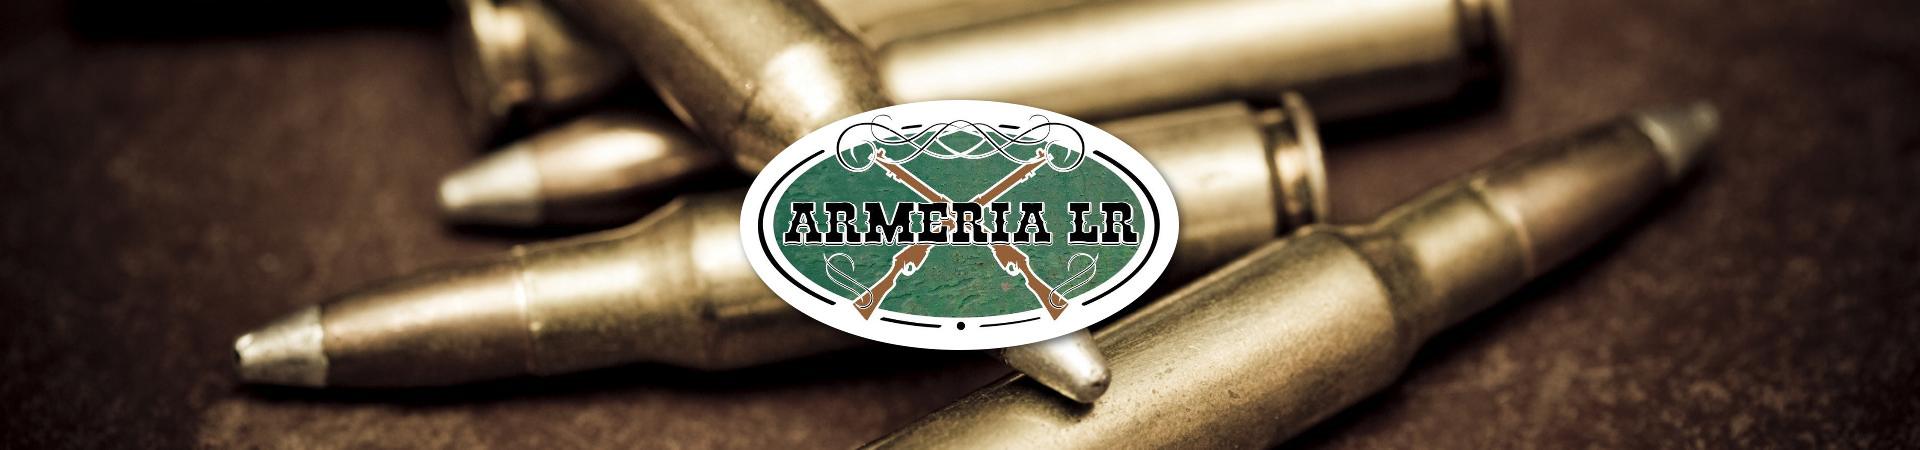 ARMERIA LR